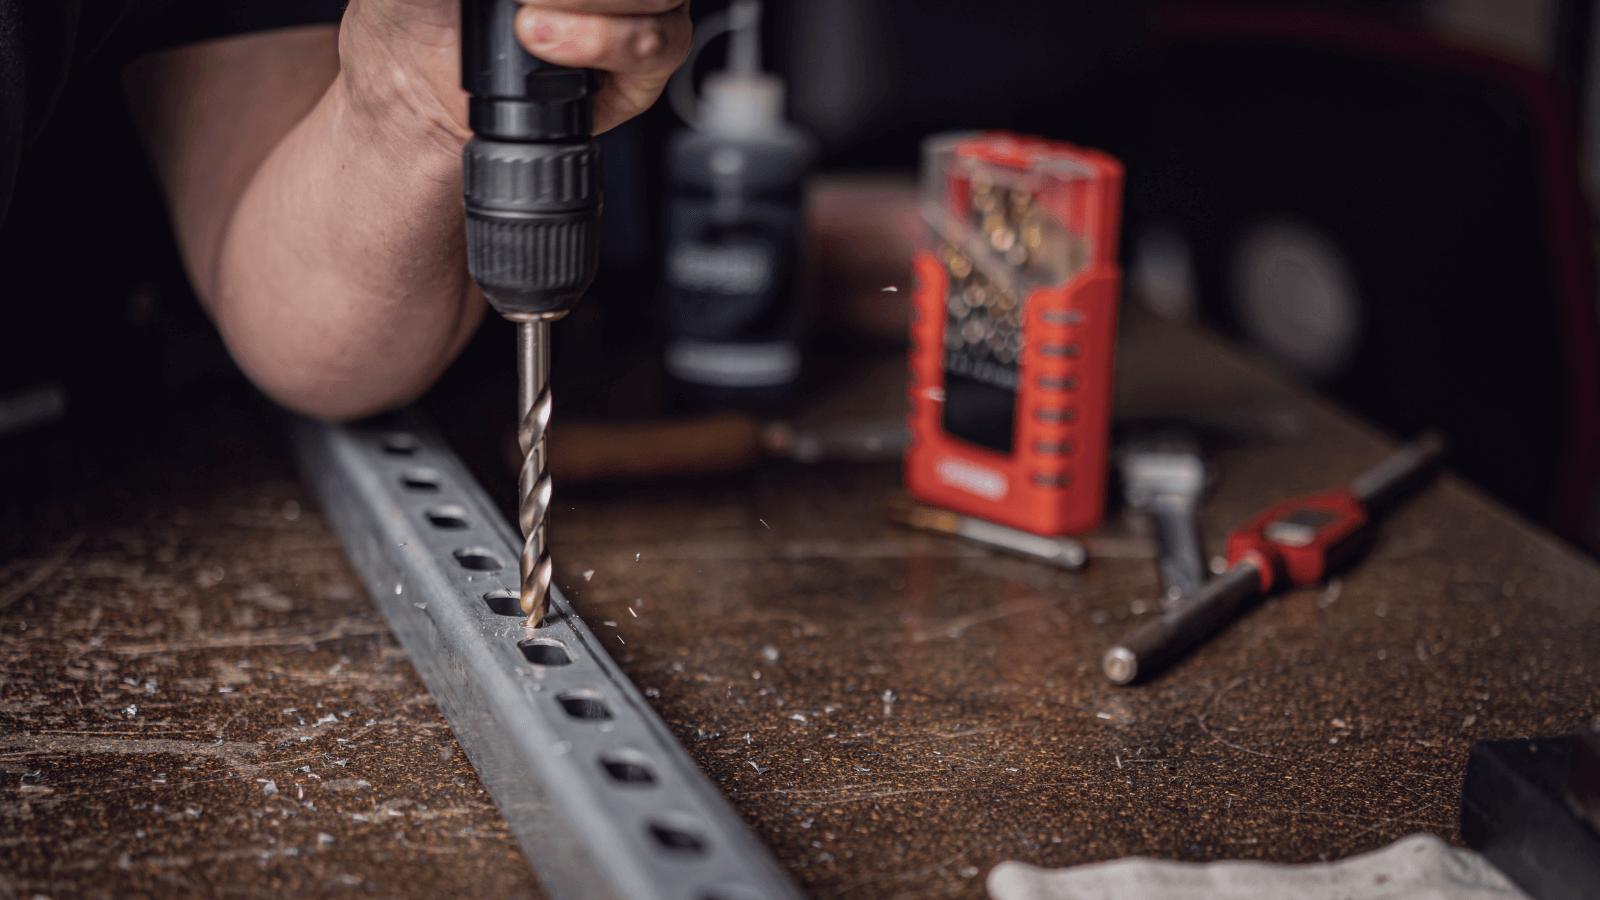 tool-rental-business